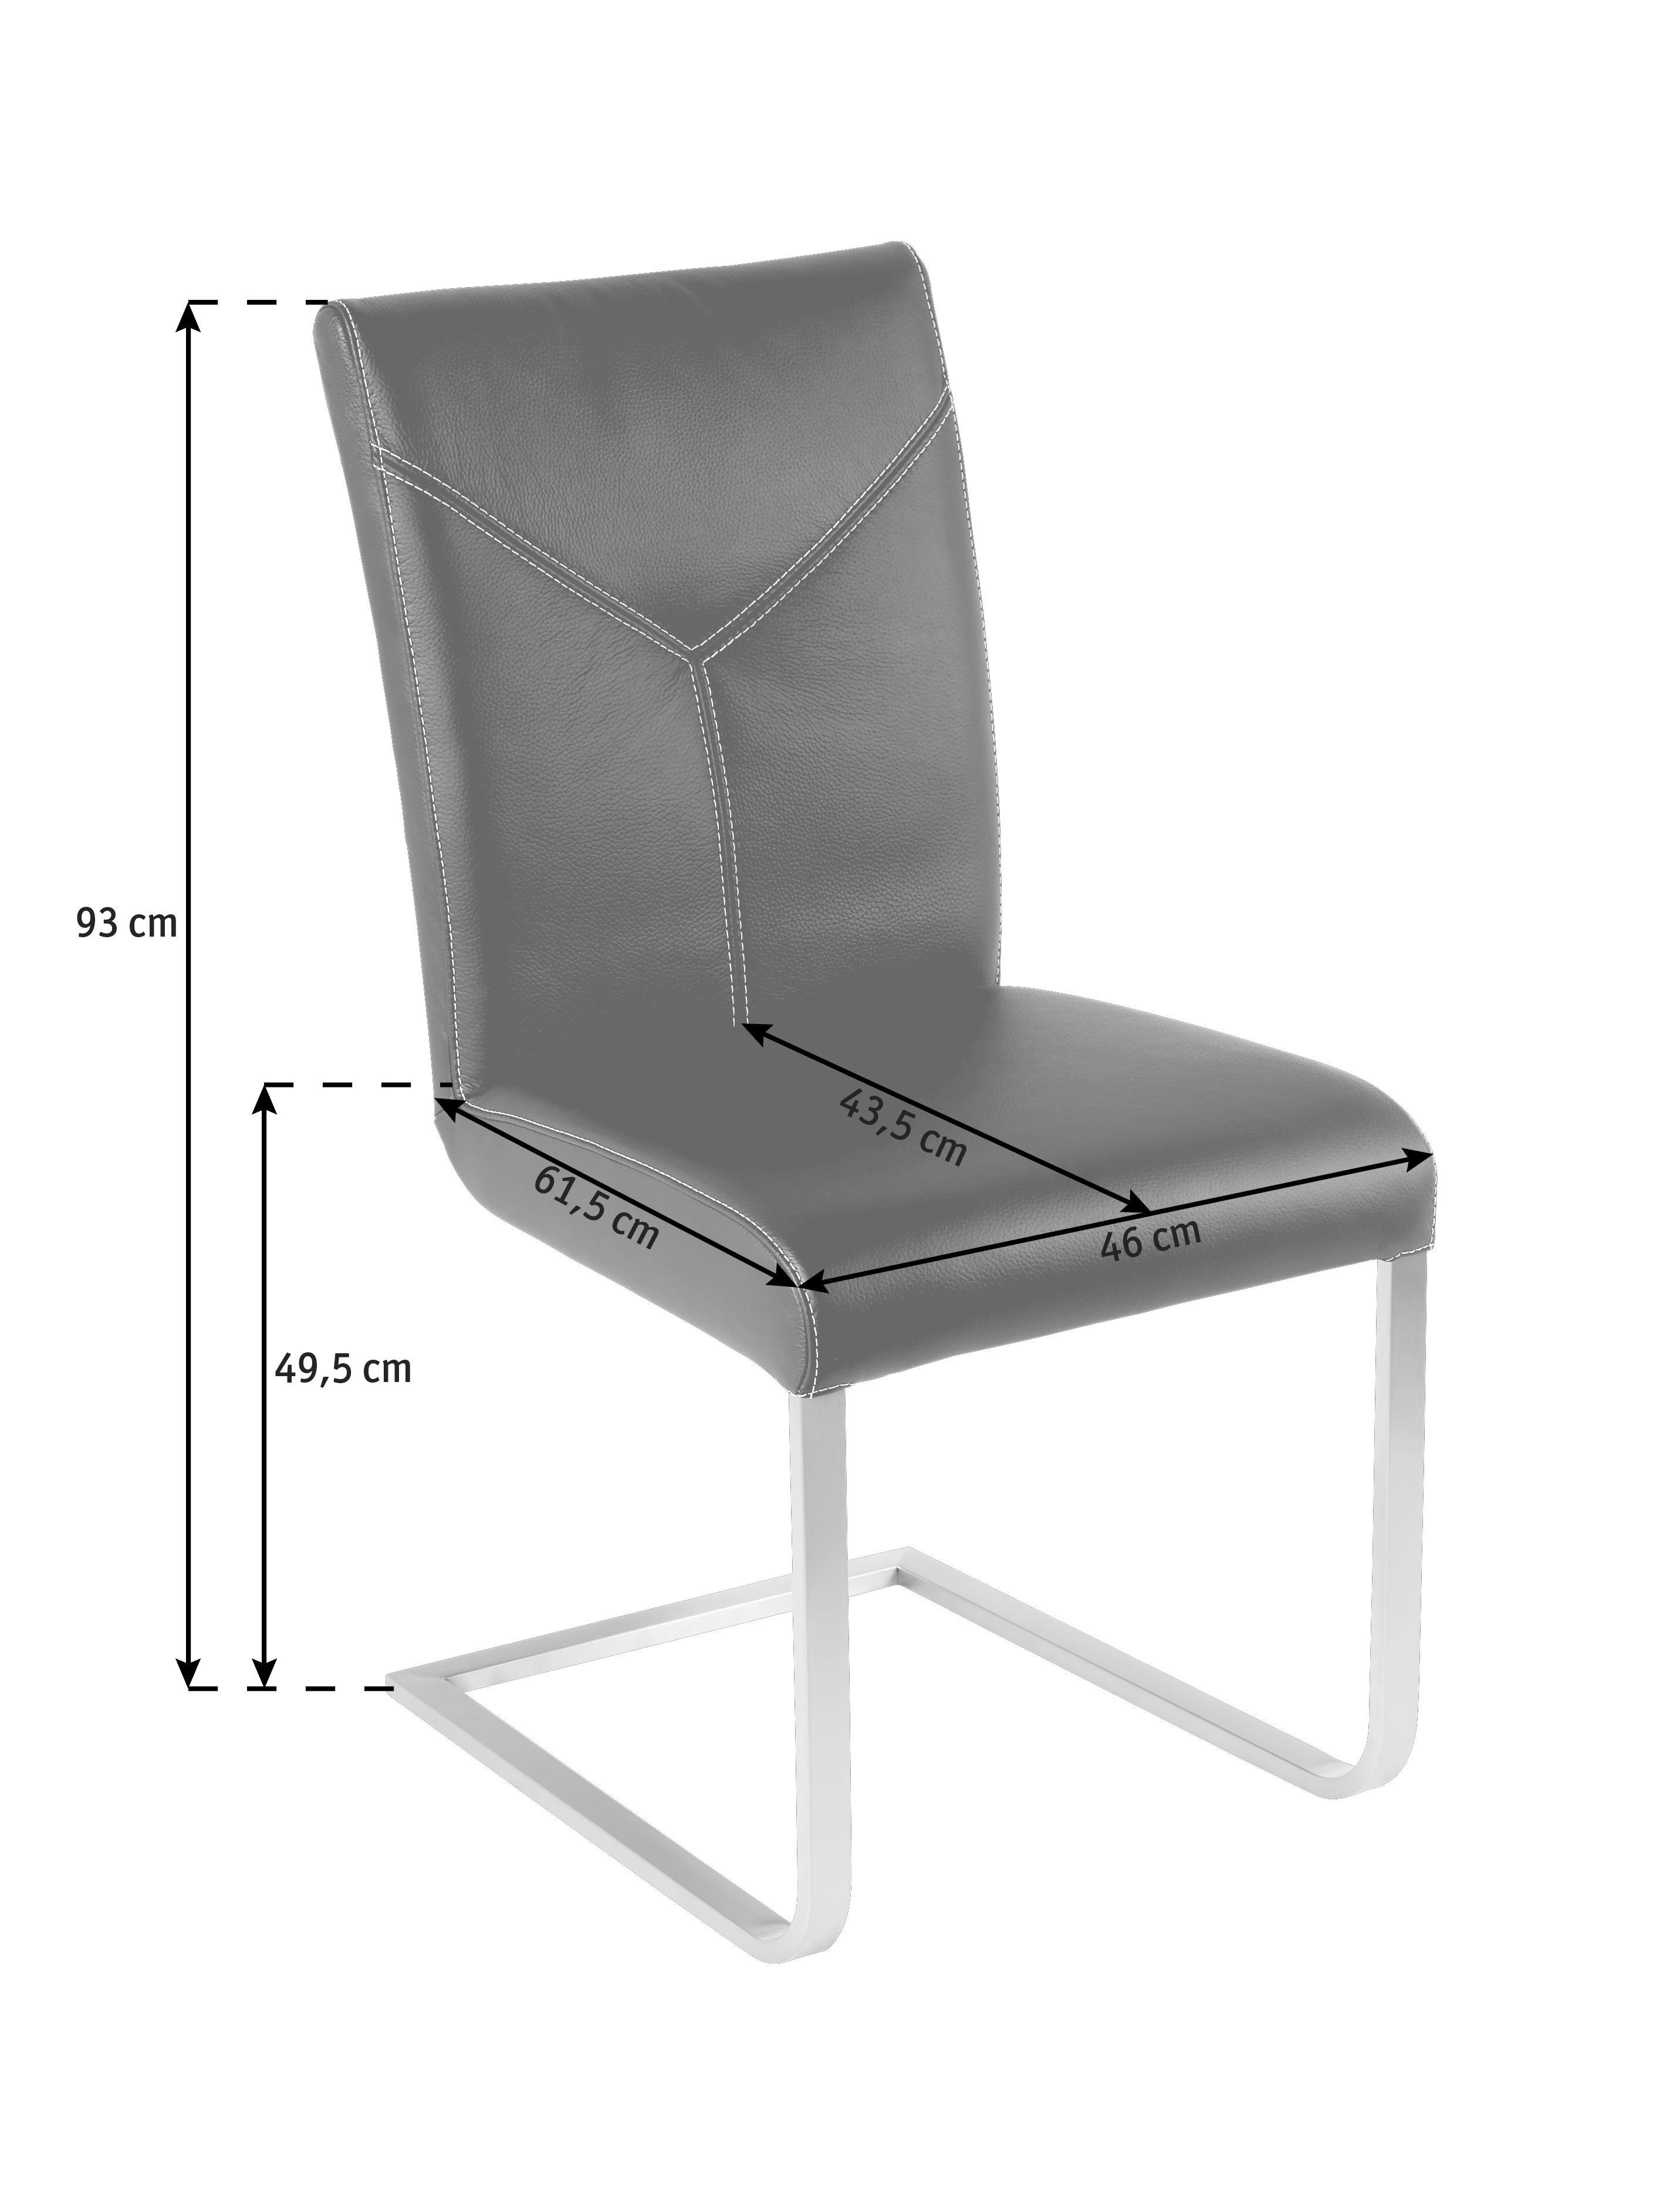 SCHWINGSTUHL Echtleder Dunkelbraun, Edelstahlfarben - Edelstahlfarben/Beige, Design, Leder/Metall (46/93/61,5cm) - NOVEL